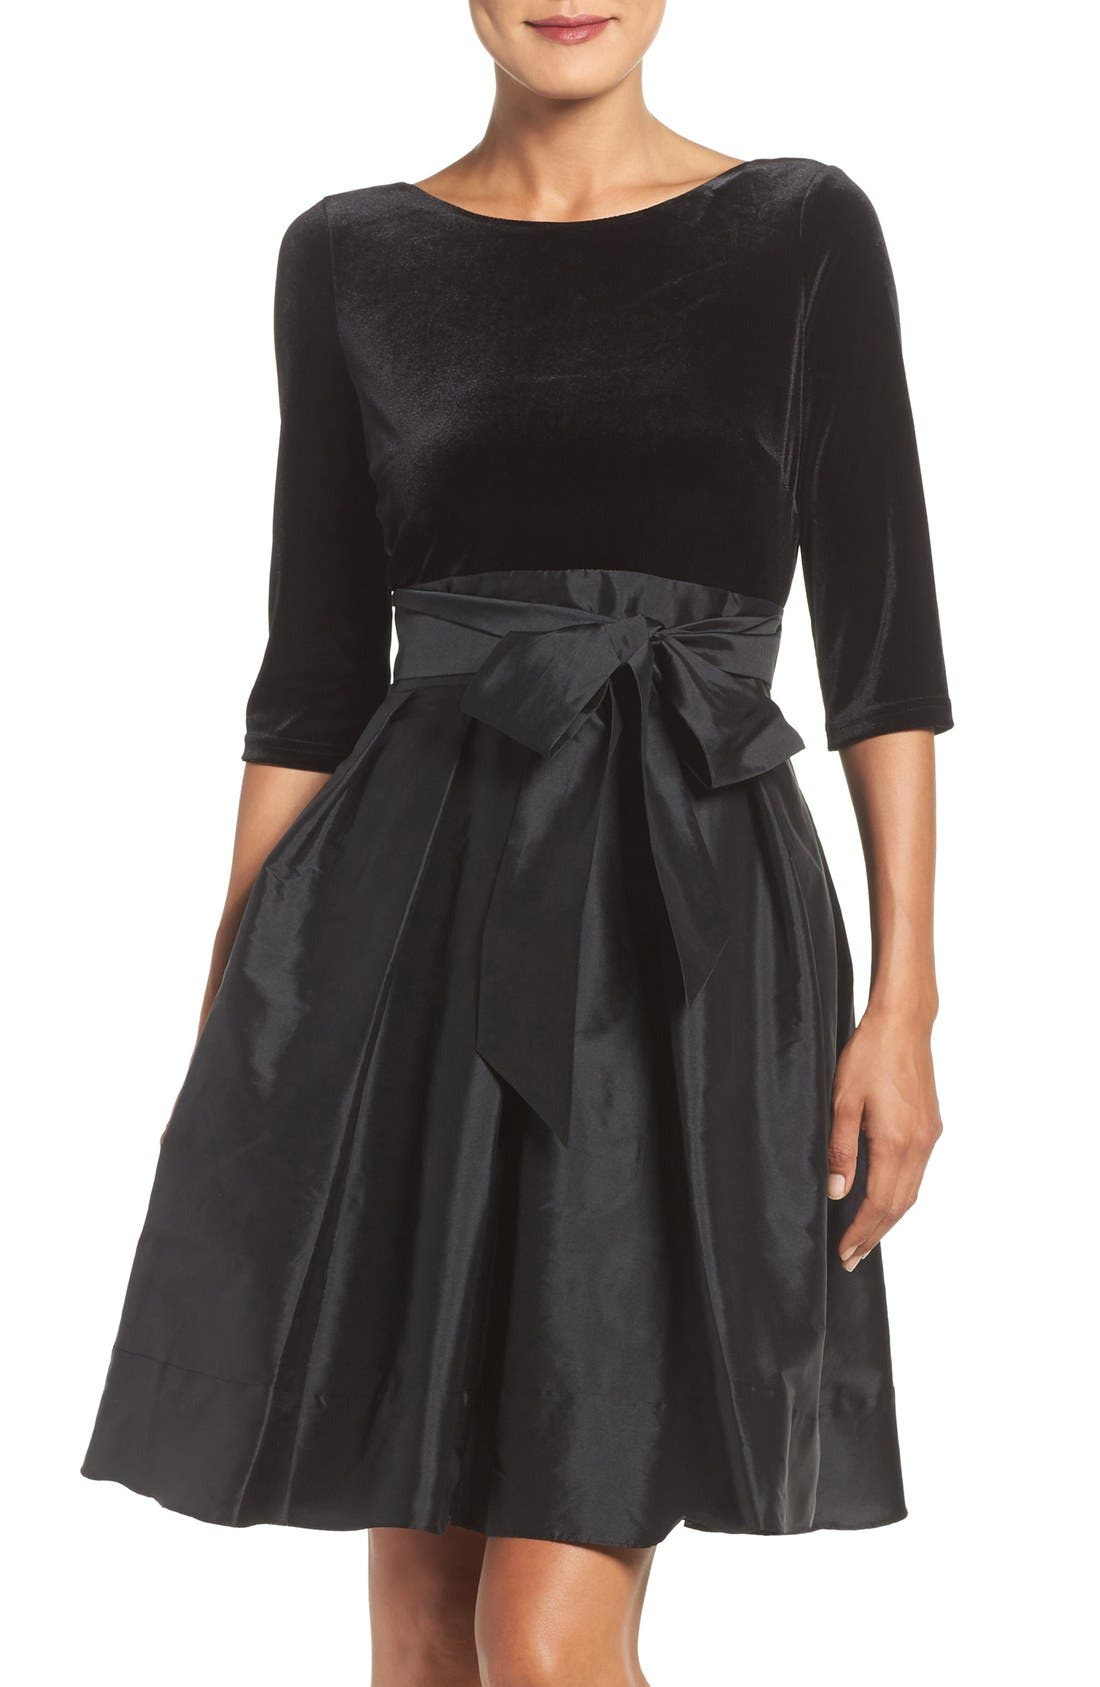 Main Image - Adrianna Papell Velvet & Taffeta Fit & Flare Dress